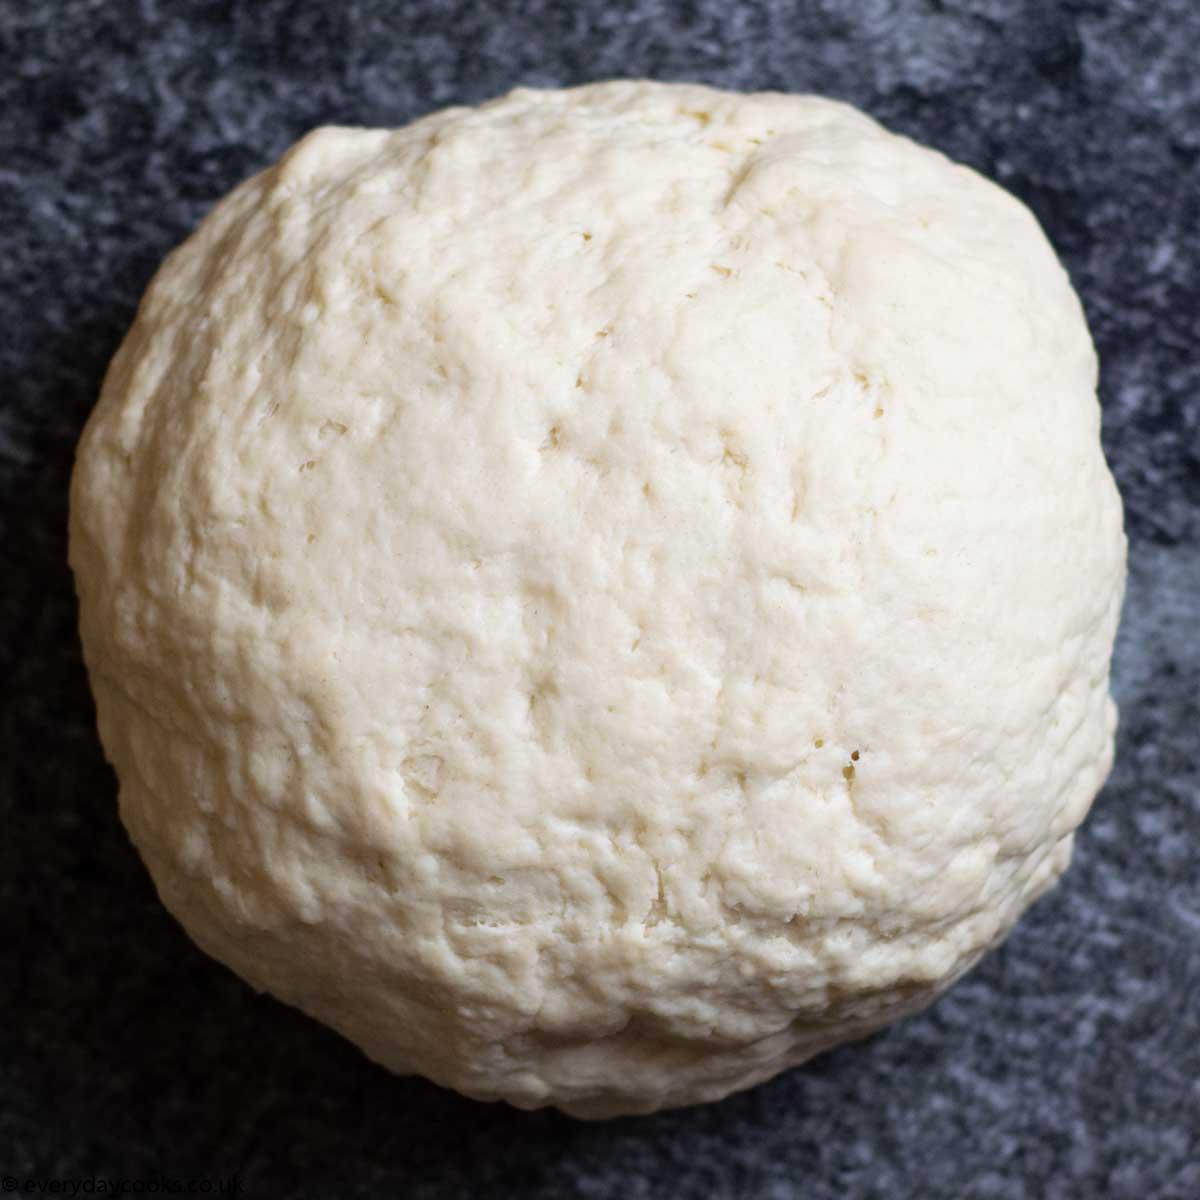 Ball of kneaded dough